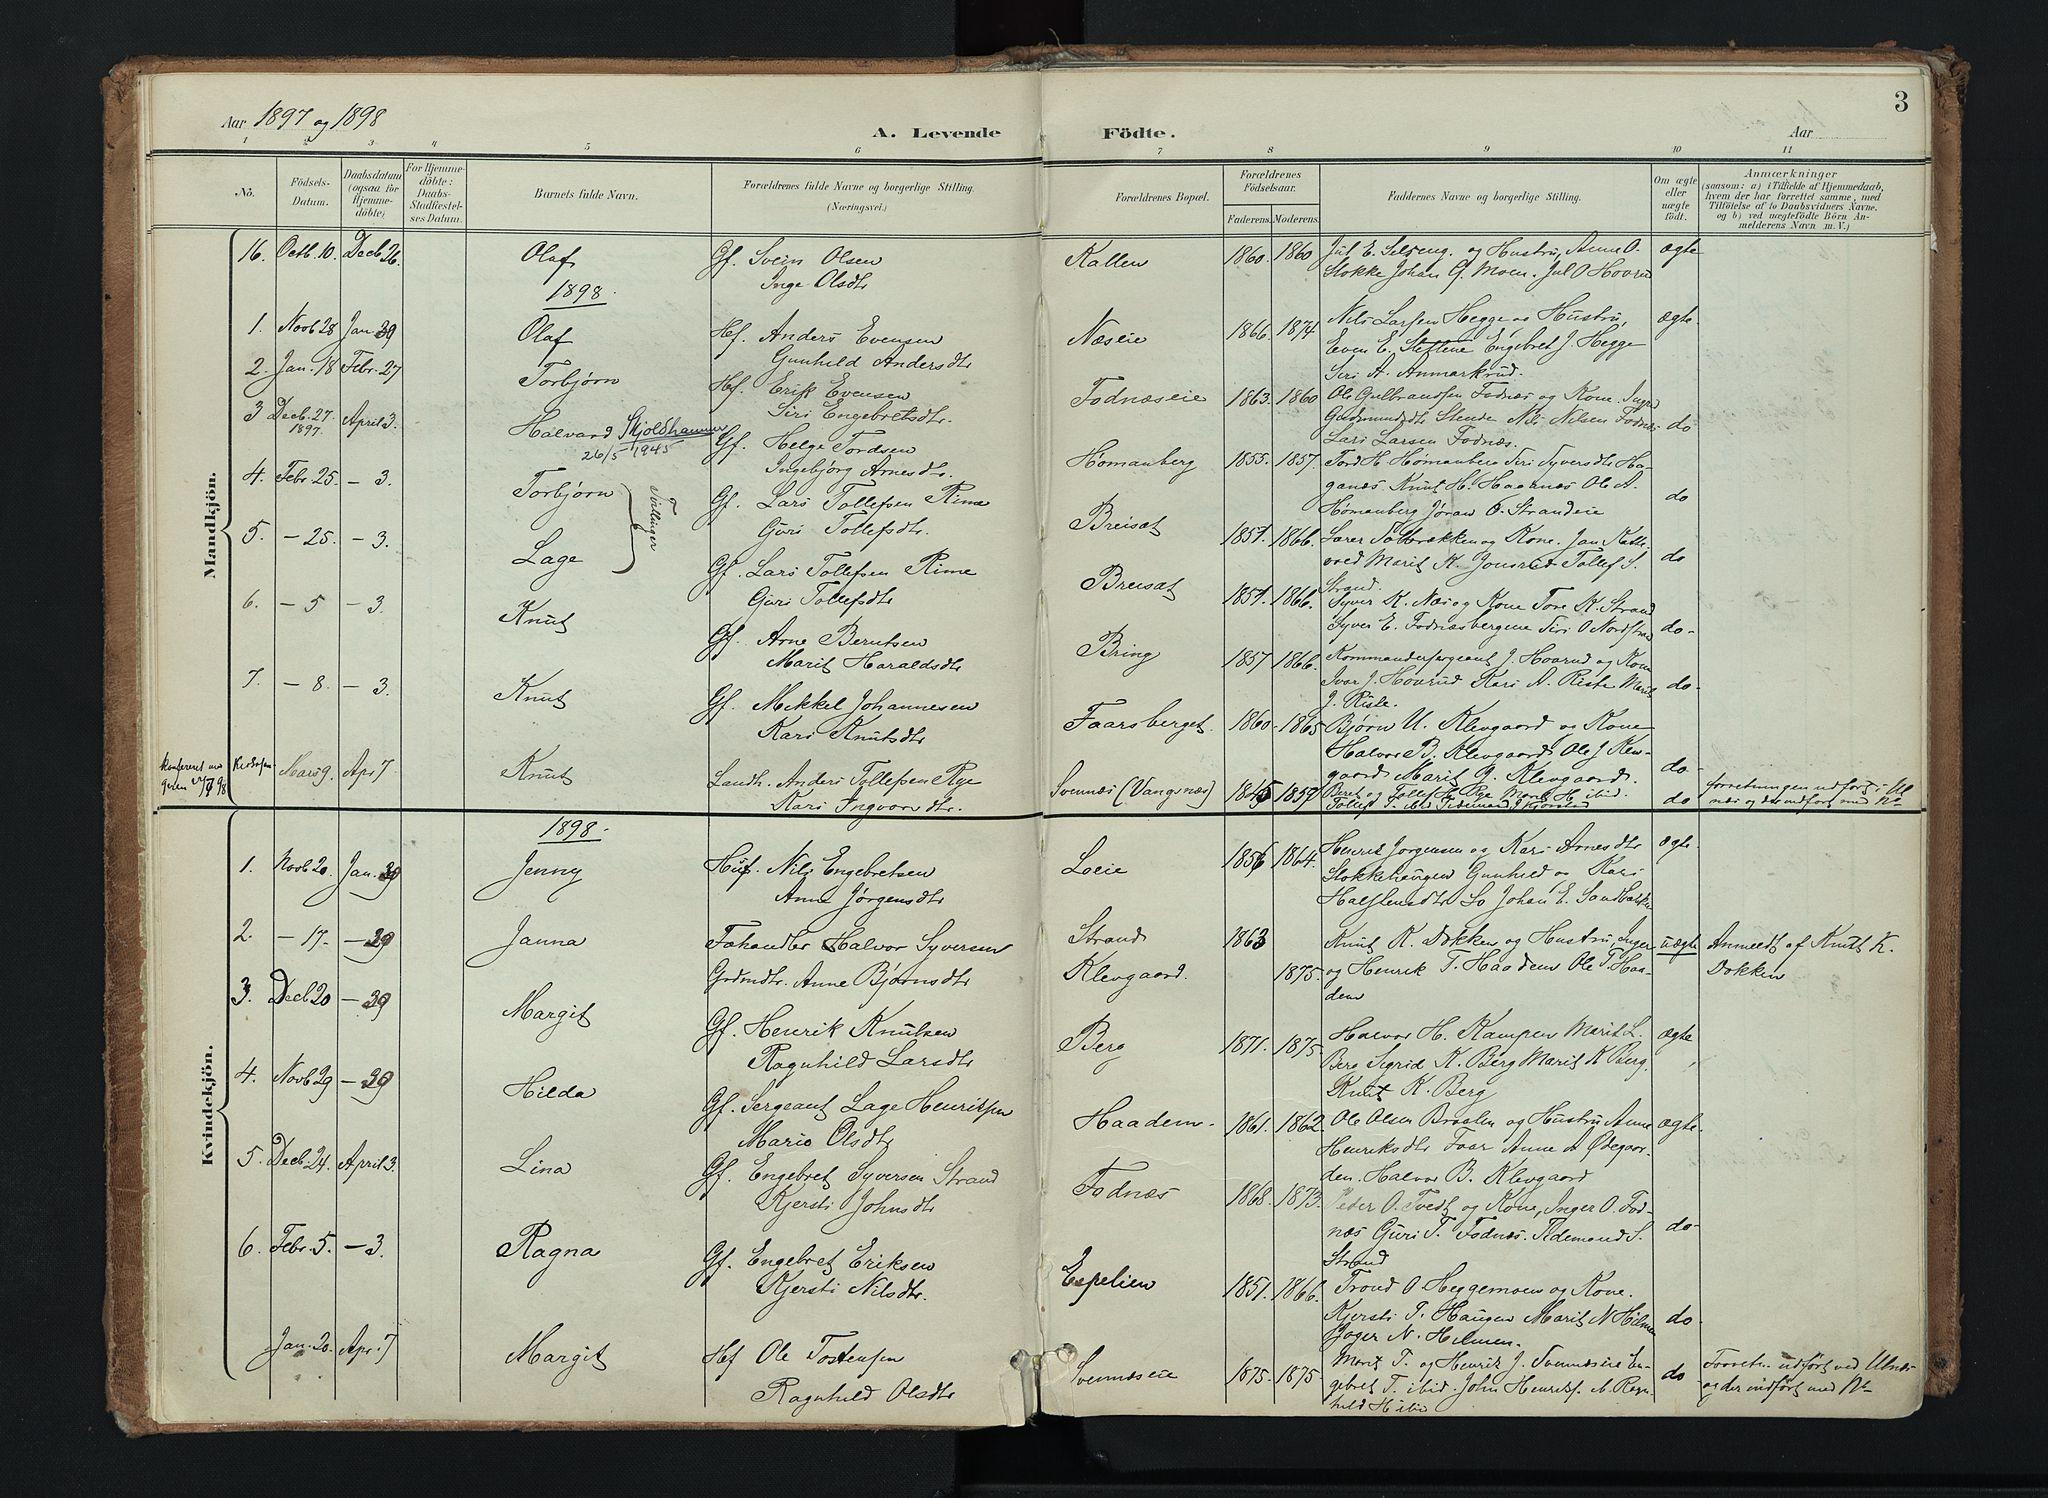 SAH, Nord-Aurdal prestekontor, Ministerialbok nr. 16, 1897-1925, s. 3